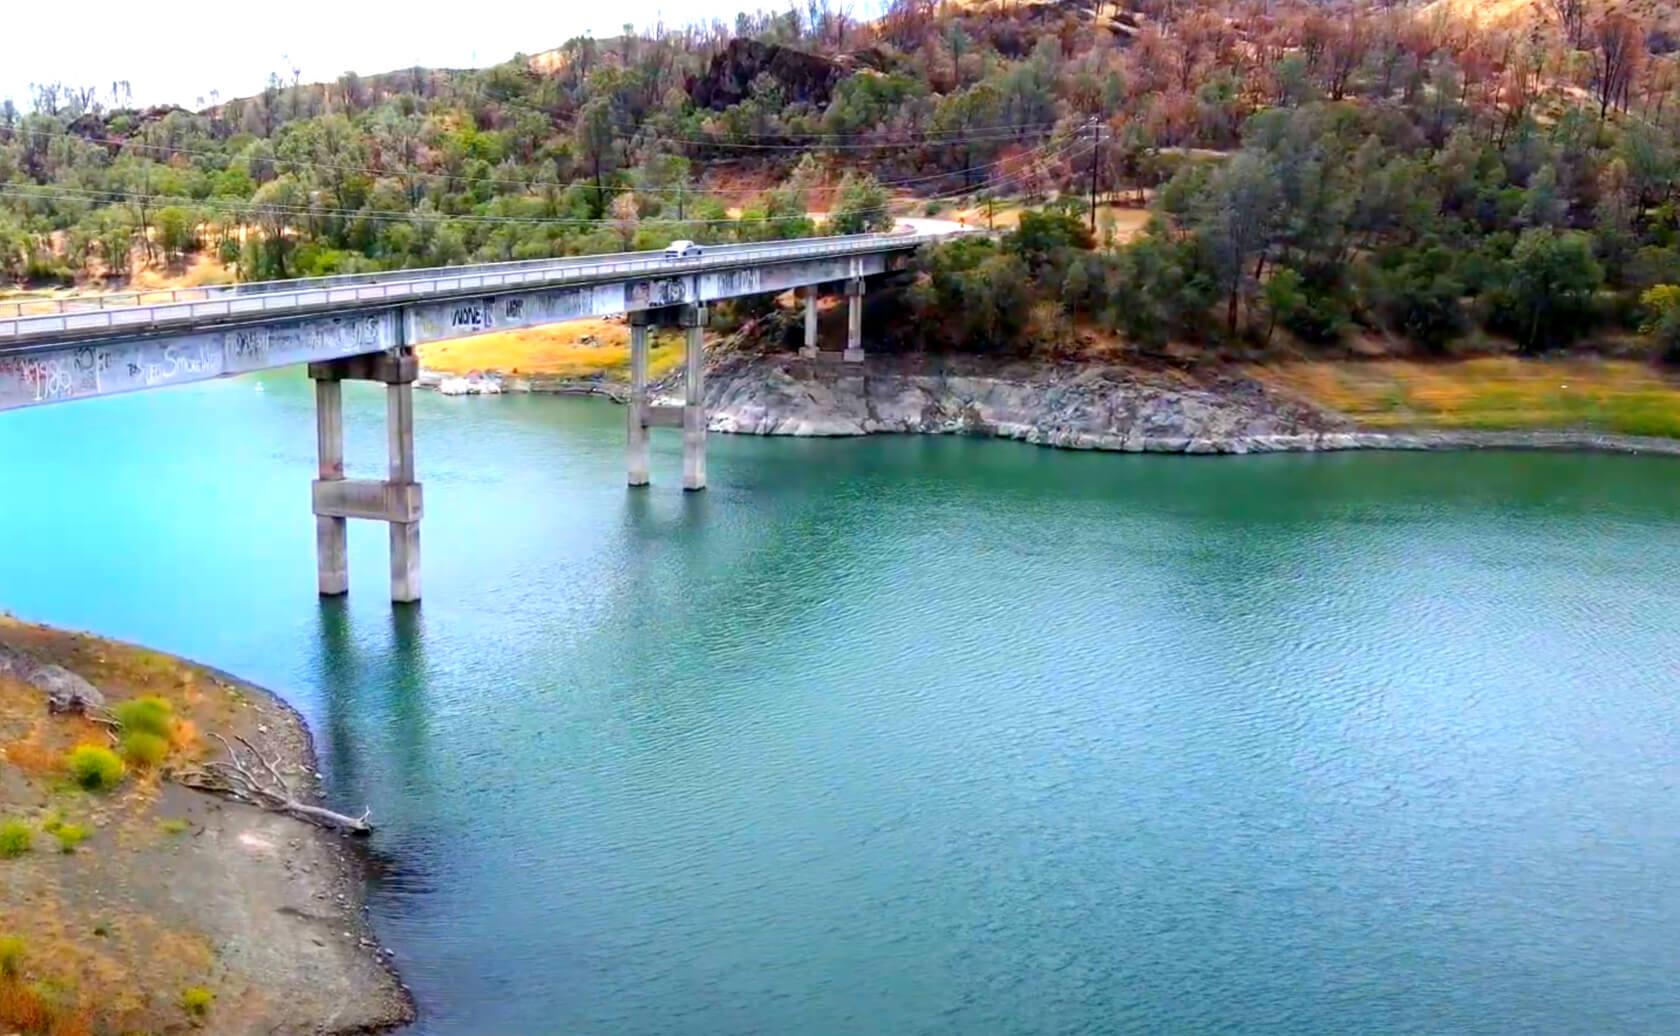 Lake-Berryessa-Fishing-Guide-Report-Napa-CA-01